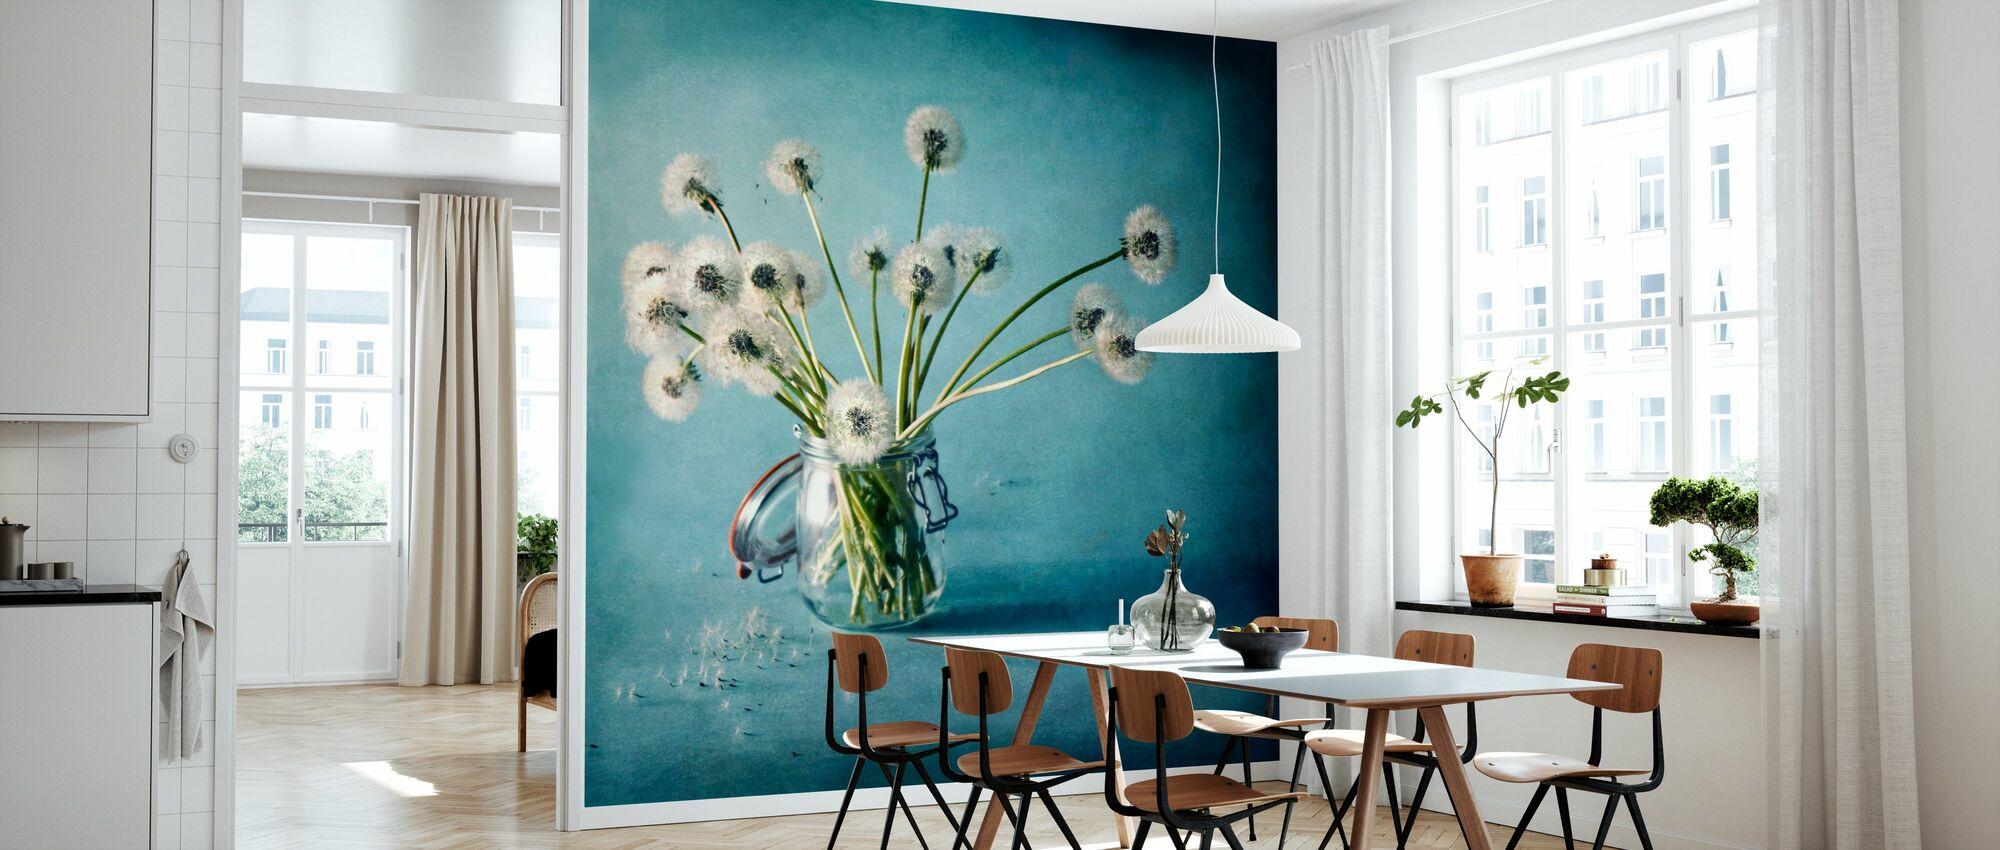 Storing Wishes - Wallpaper - Kitchen